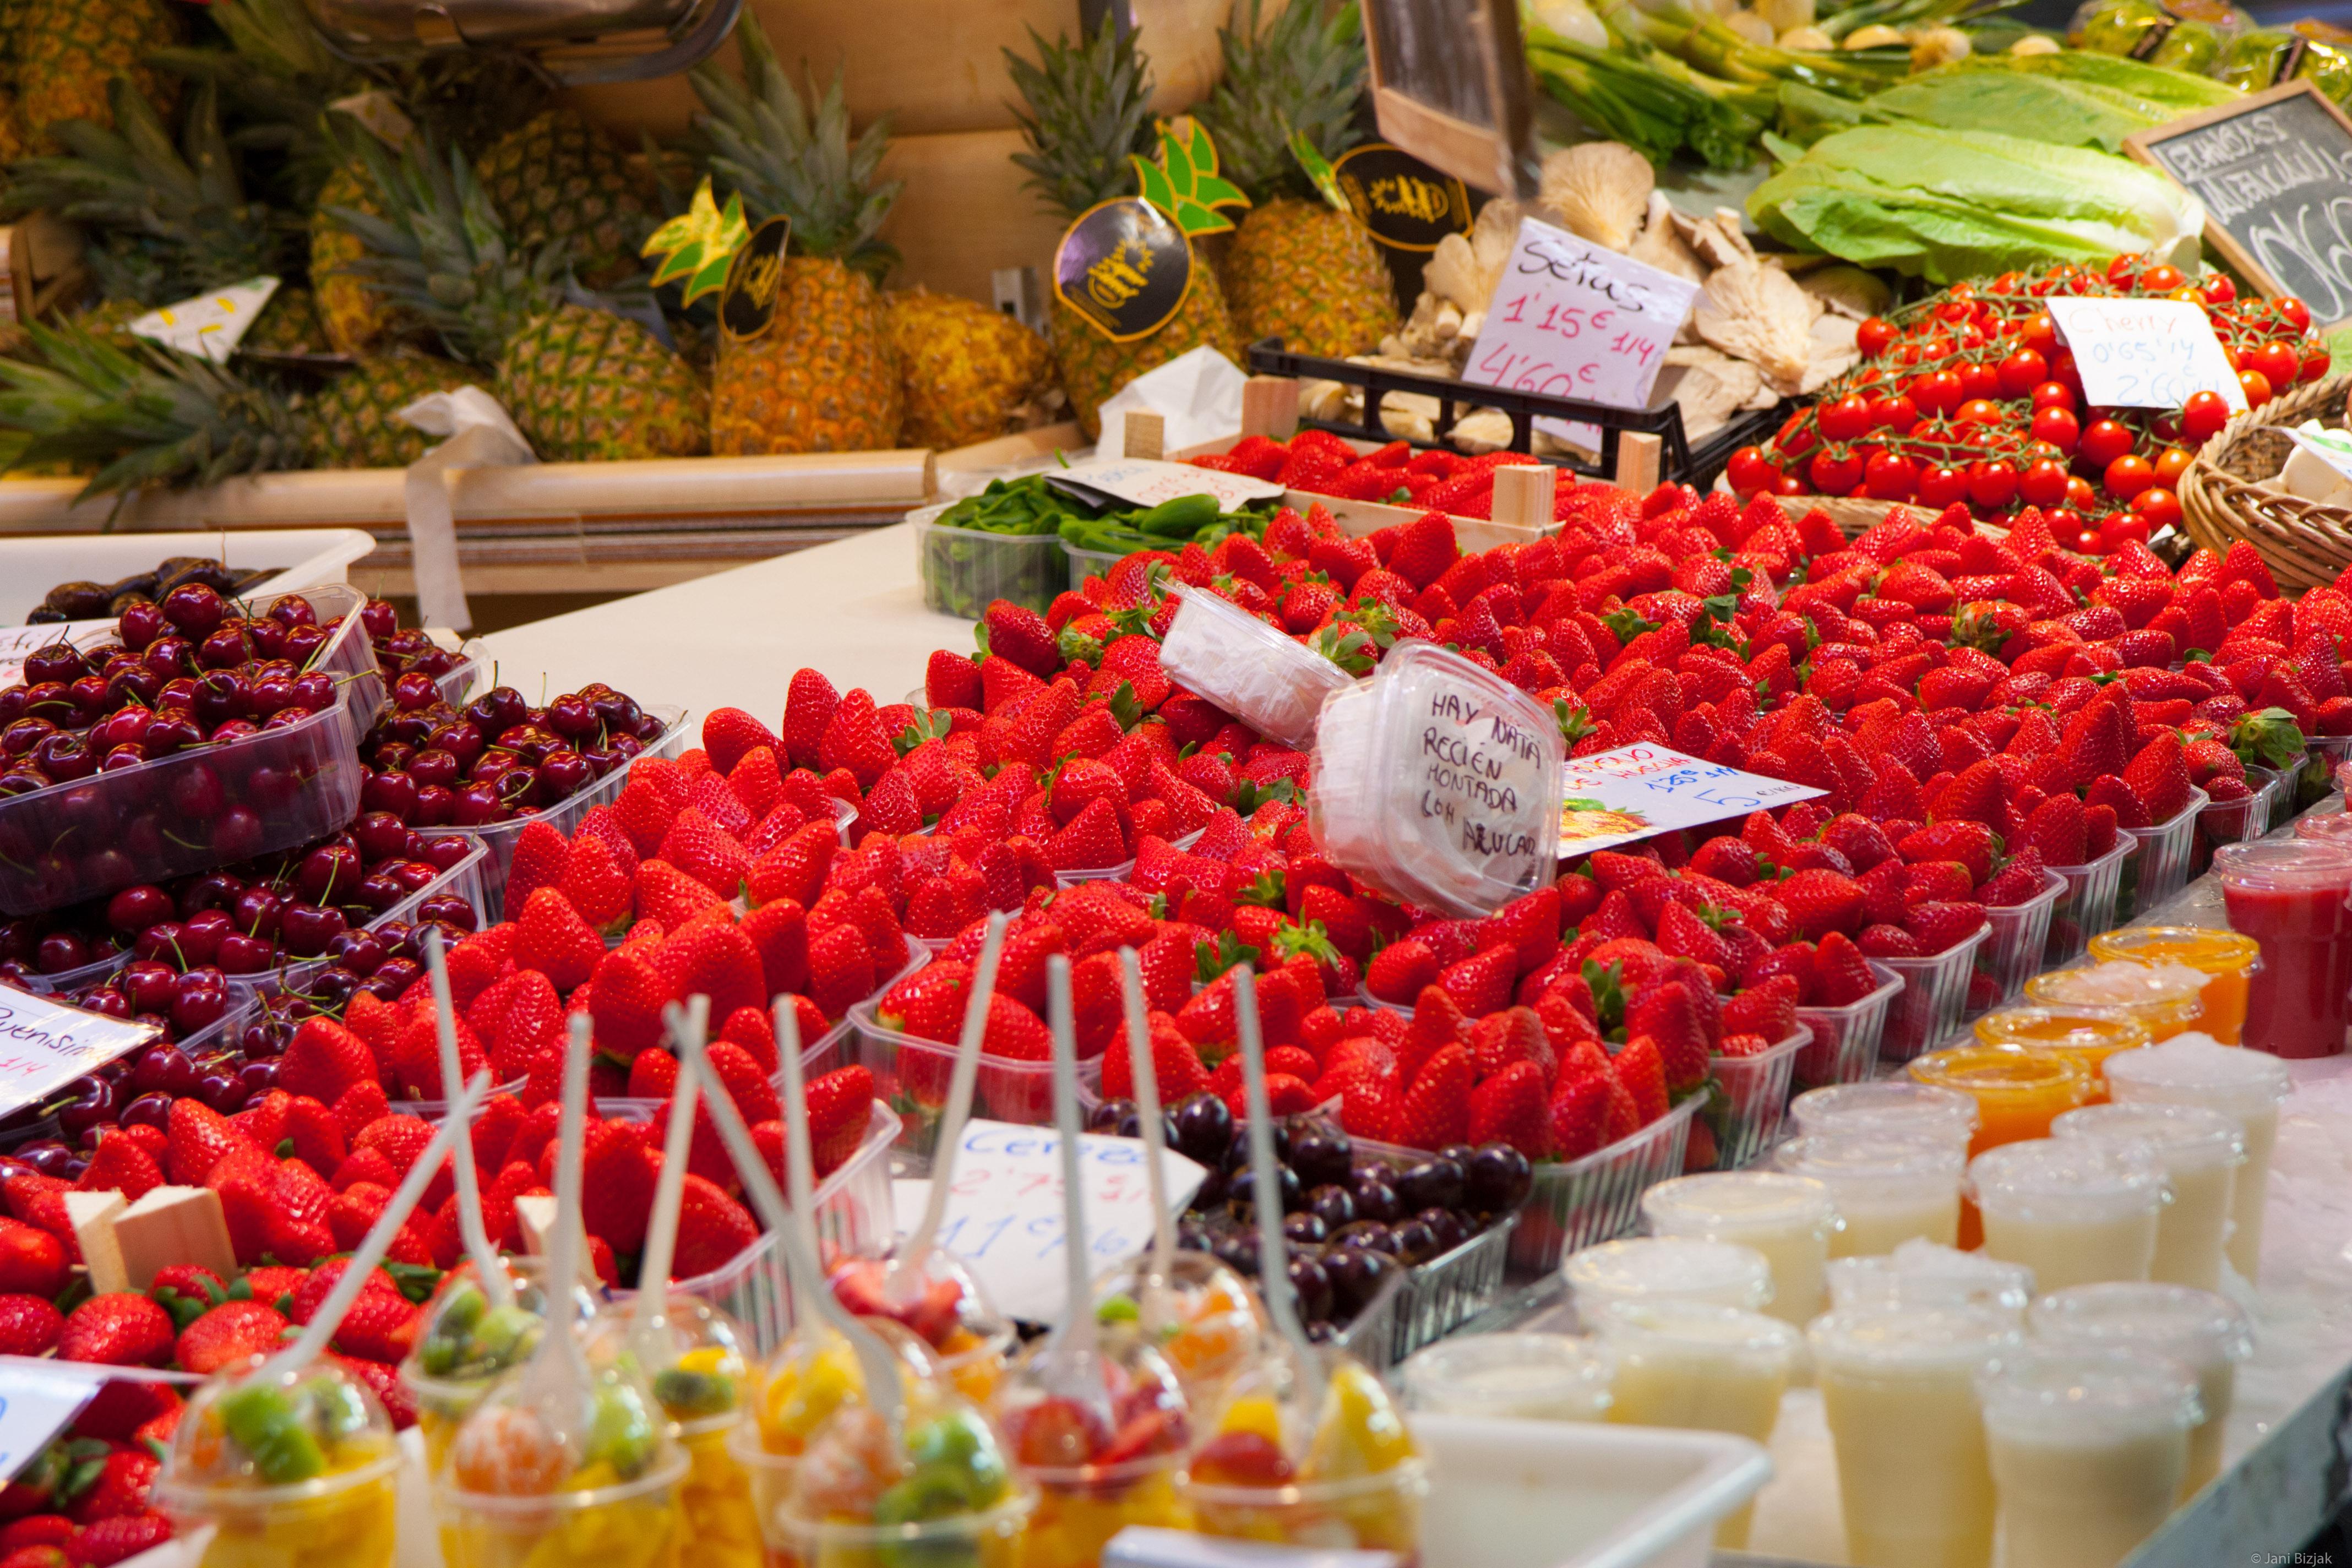 Strawberries in December.